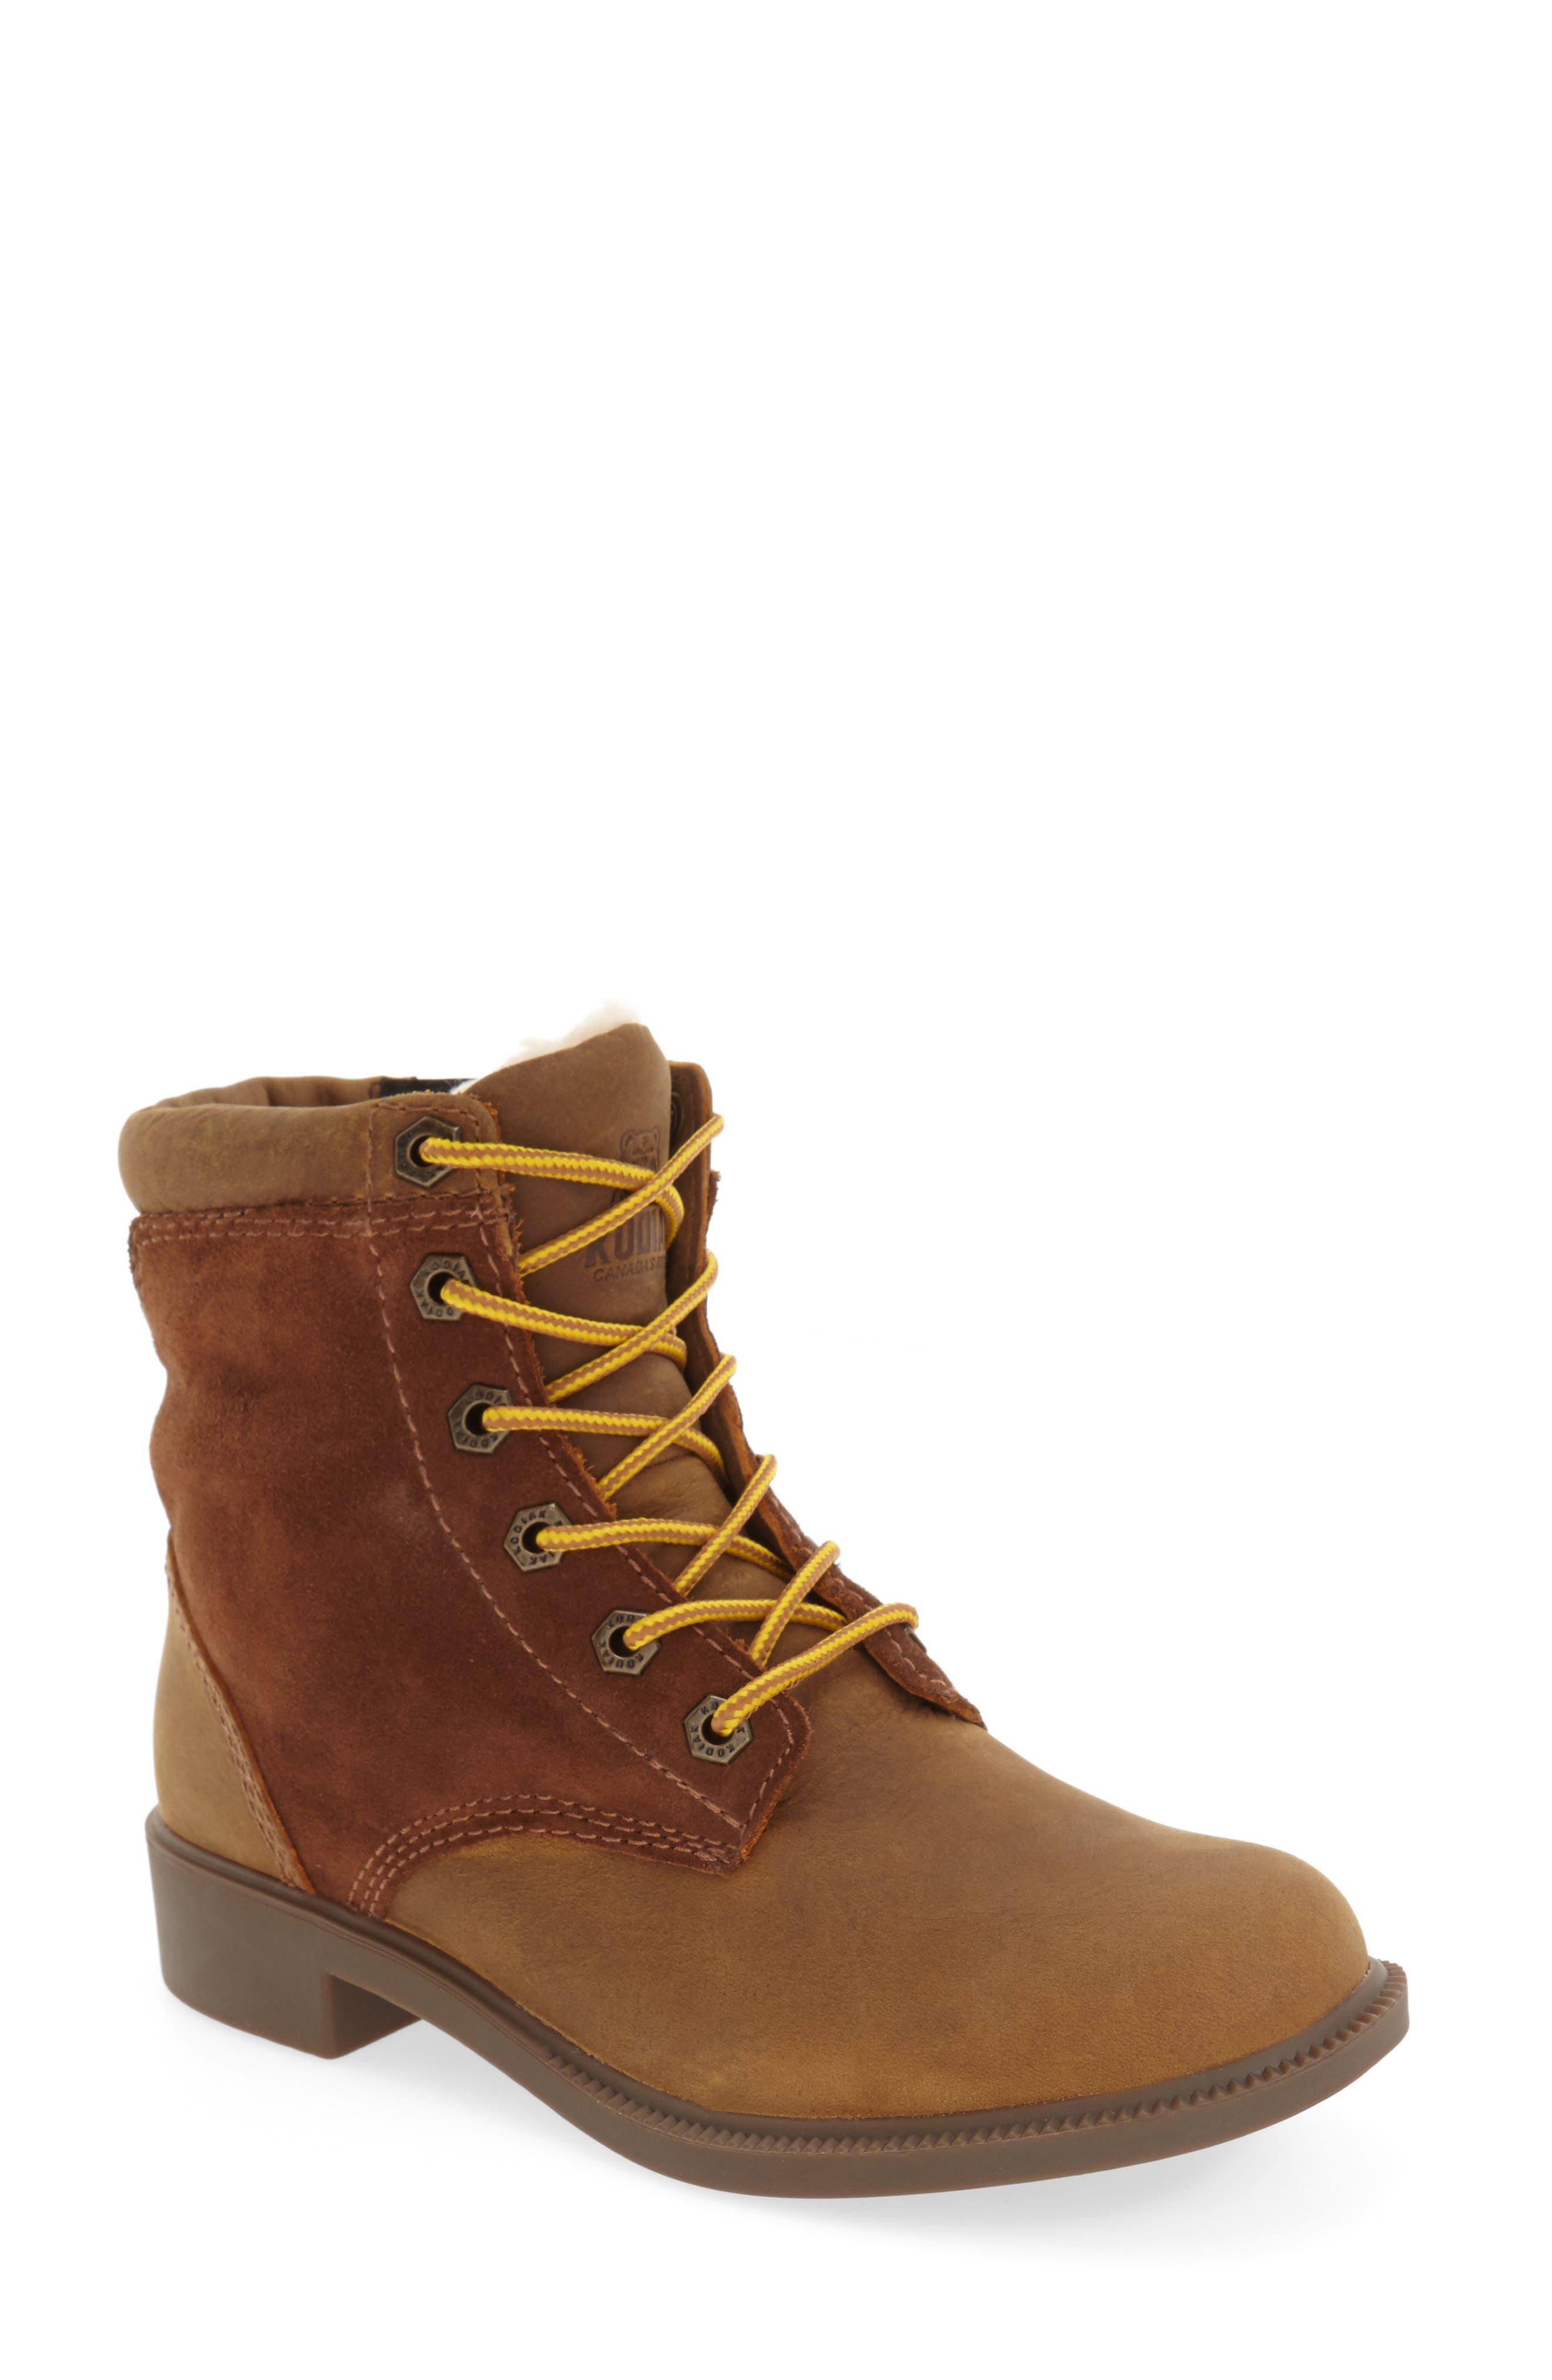 Alternate Image 1 Selected - Kodiak Original Waterproof Fleece Boot (Women)